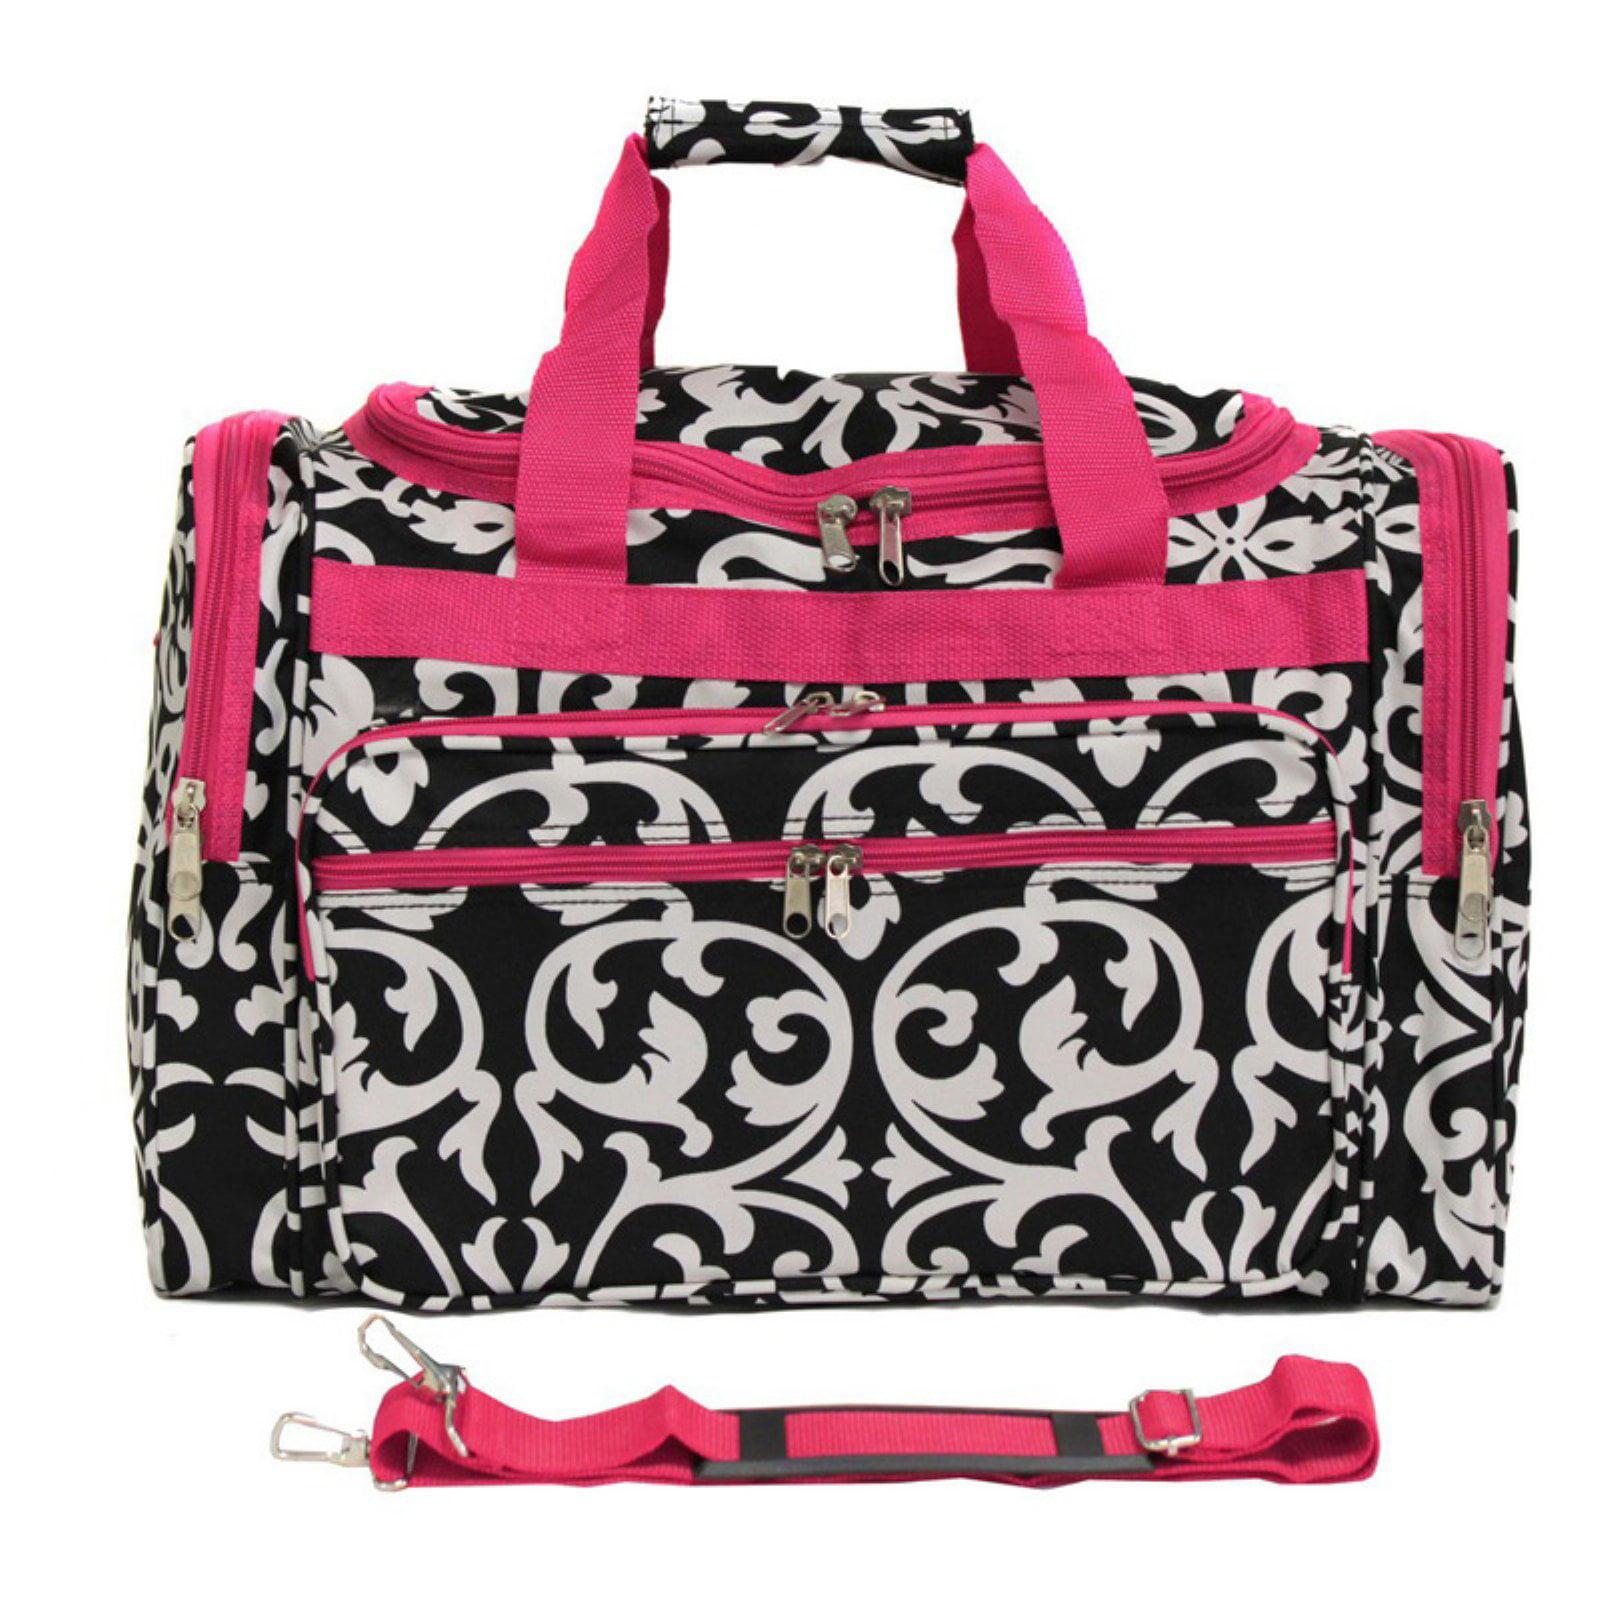 World Traveler Damask 22 in. Travel Duffel Bag by